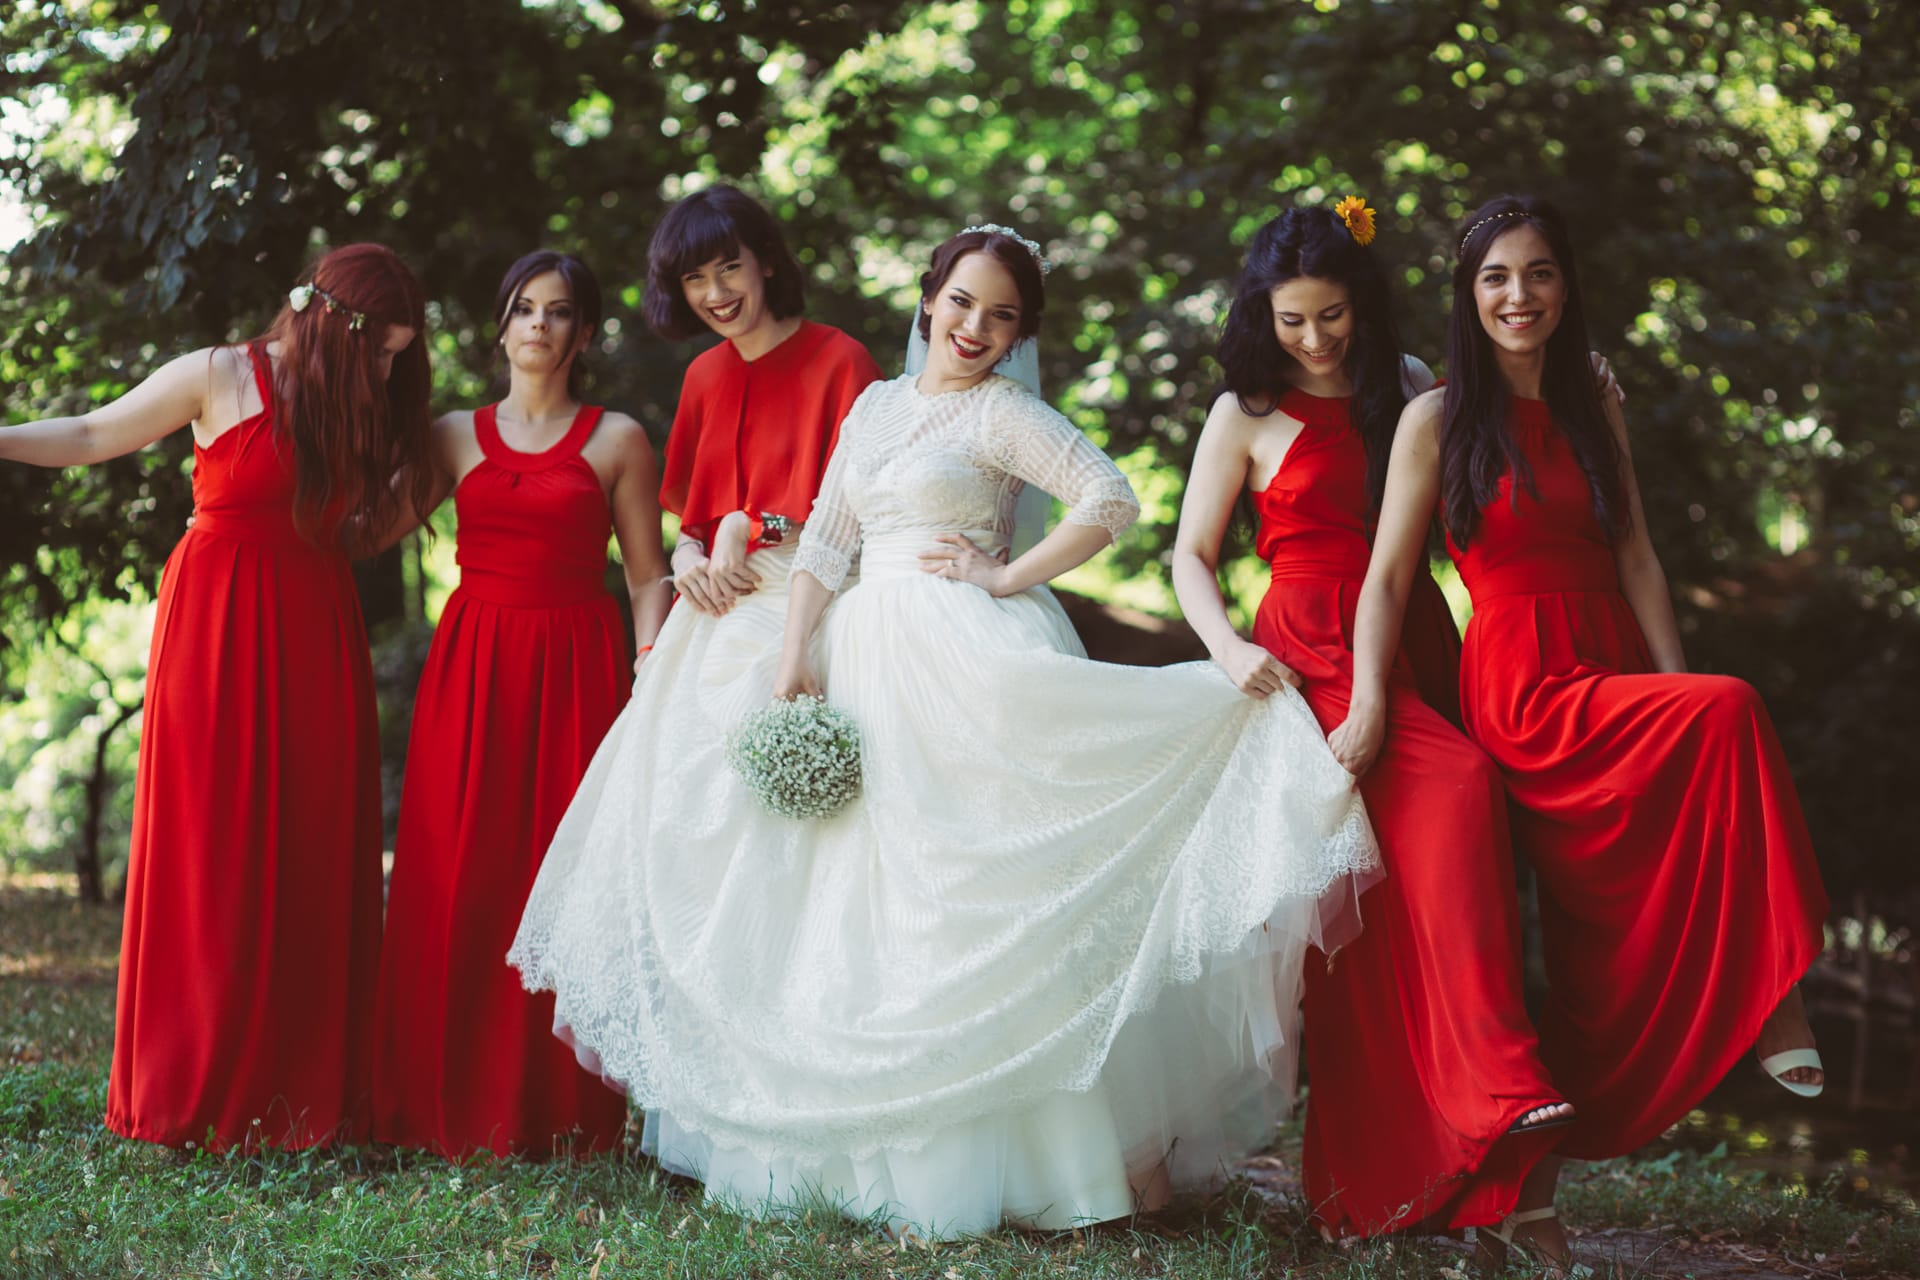 fotograf nunta craiova dragos stoenica raluca si andrei 0253